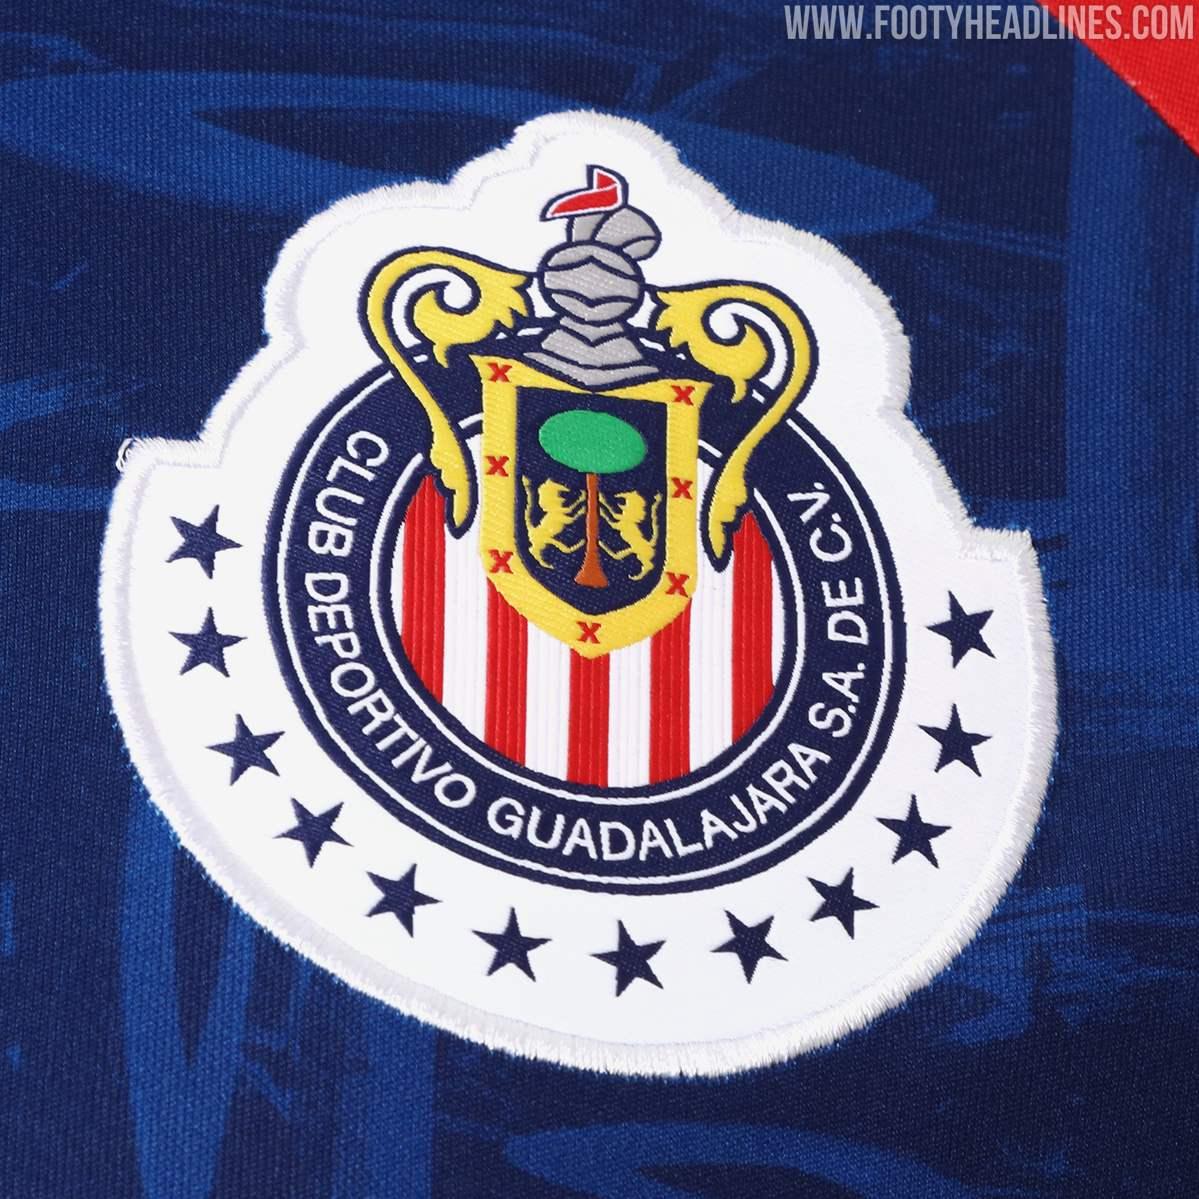 pretty nice d8fce 4577c Chivas 19-20 Home & Away Kits Released - Footy Headlines